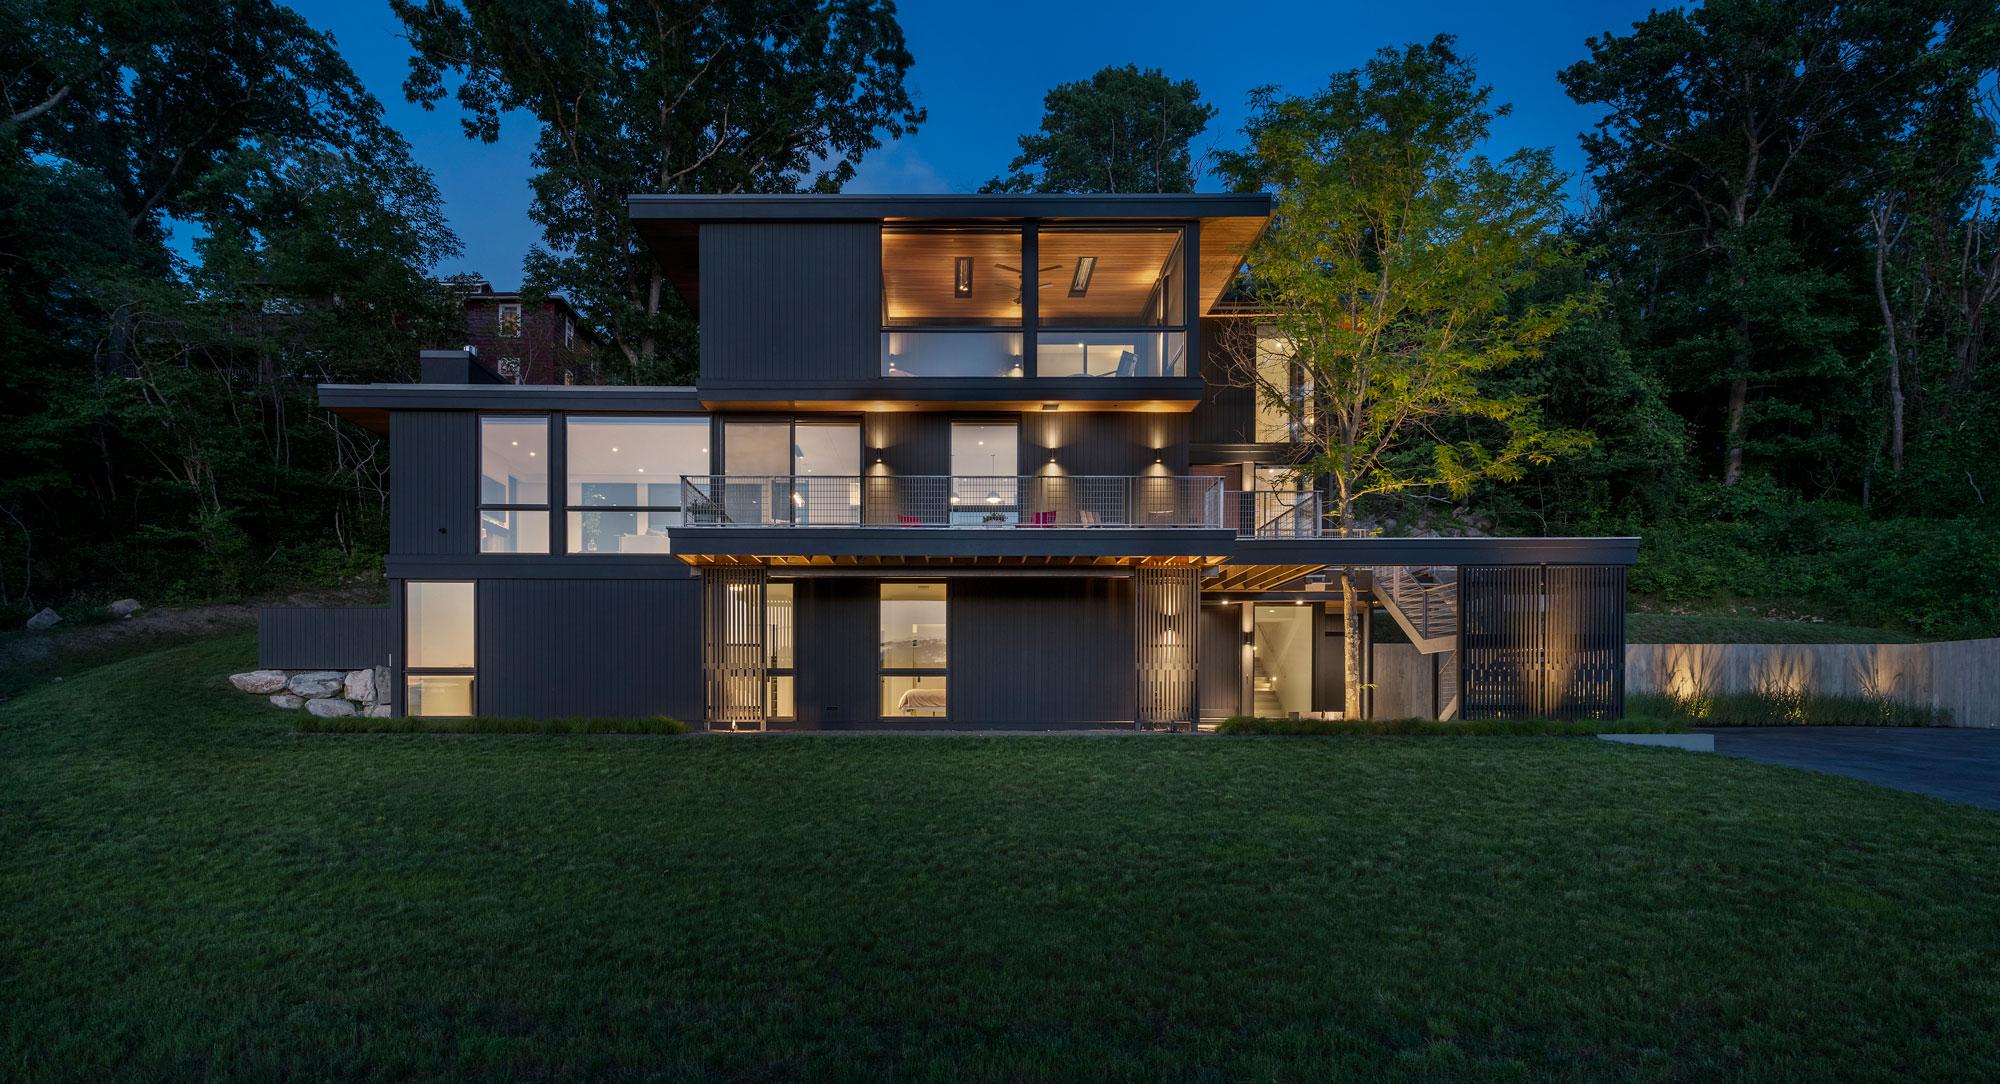 dusk photo of annisquam river house